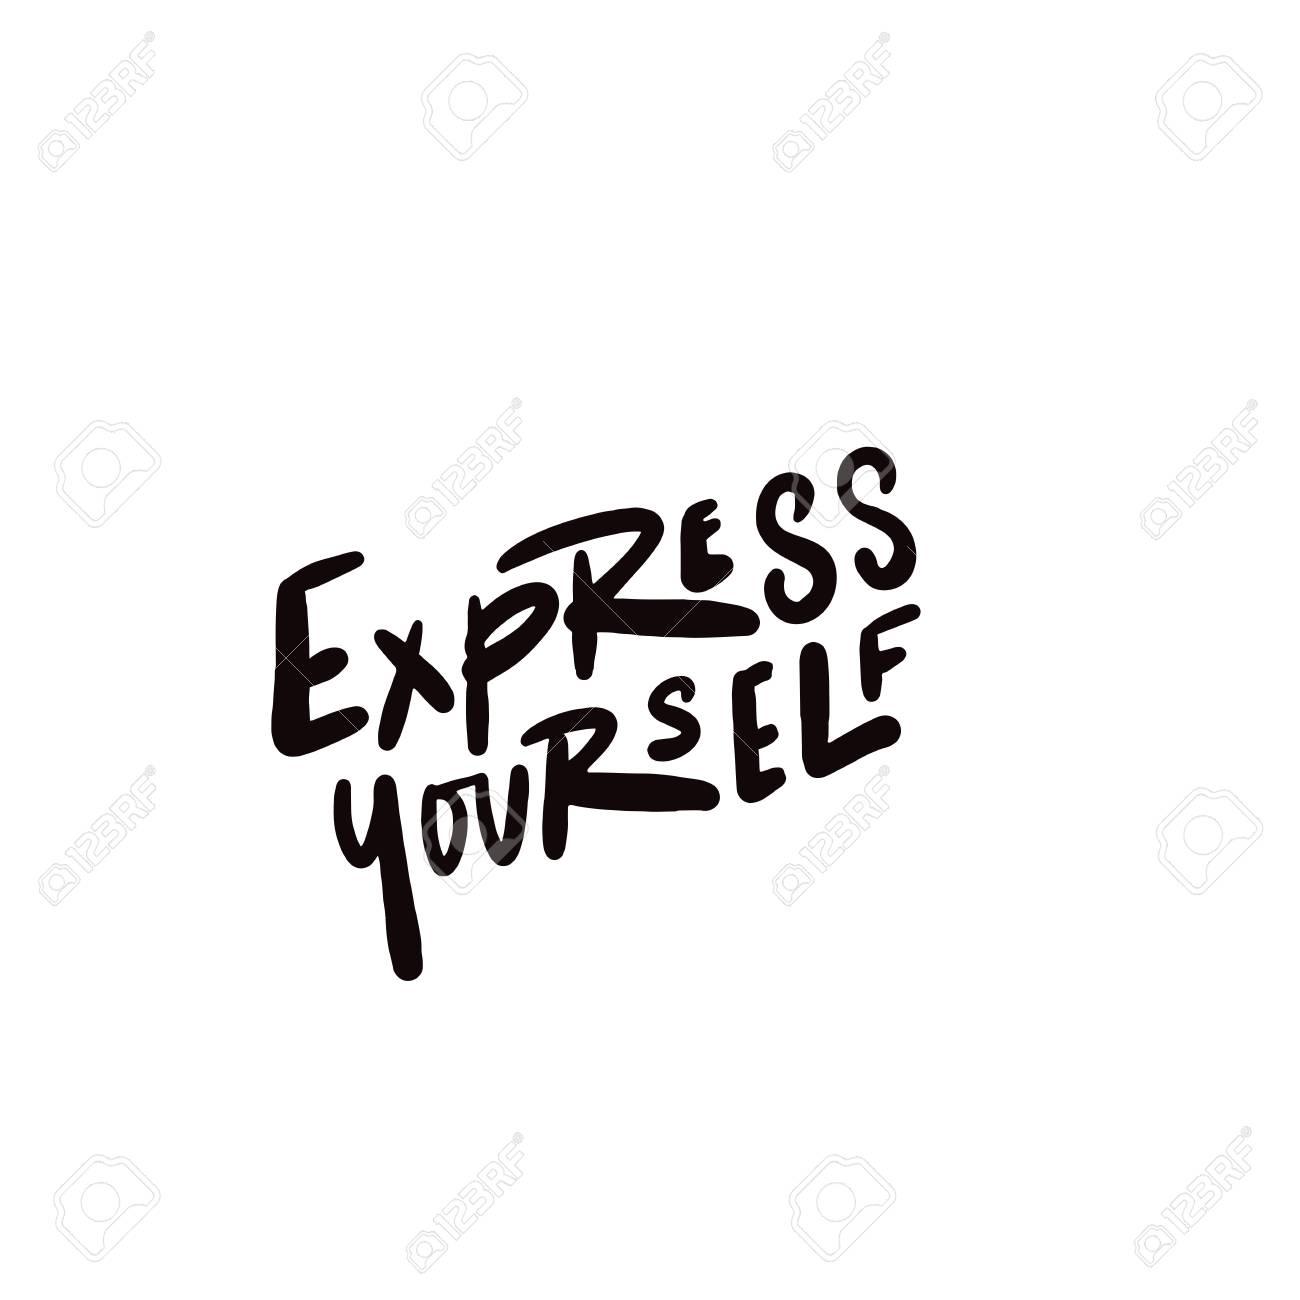 Express yourself. Hand written lettering. Vector design. - 116616897